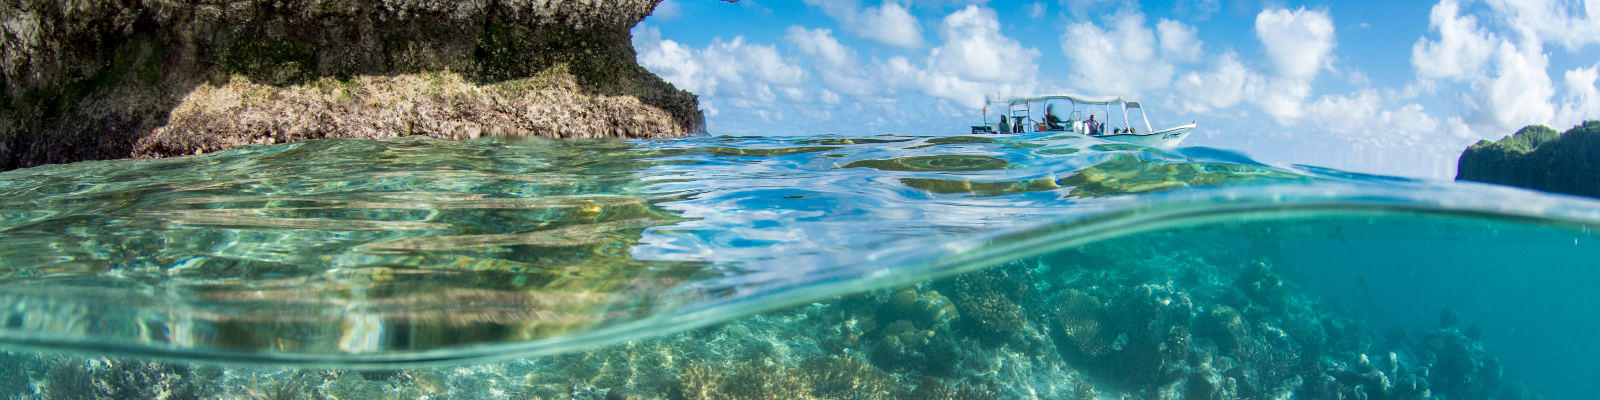 famous pacific islander